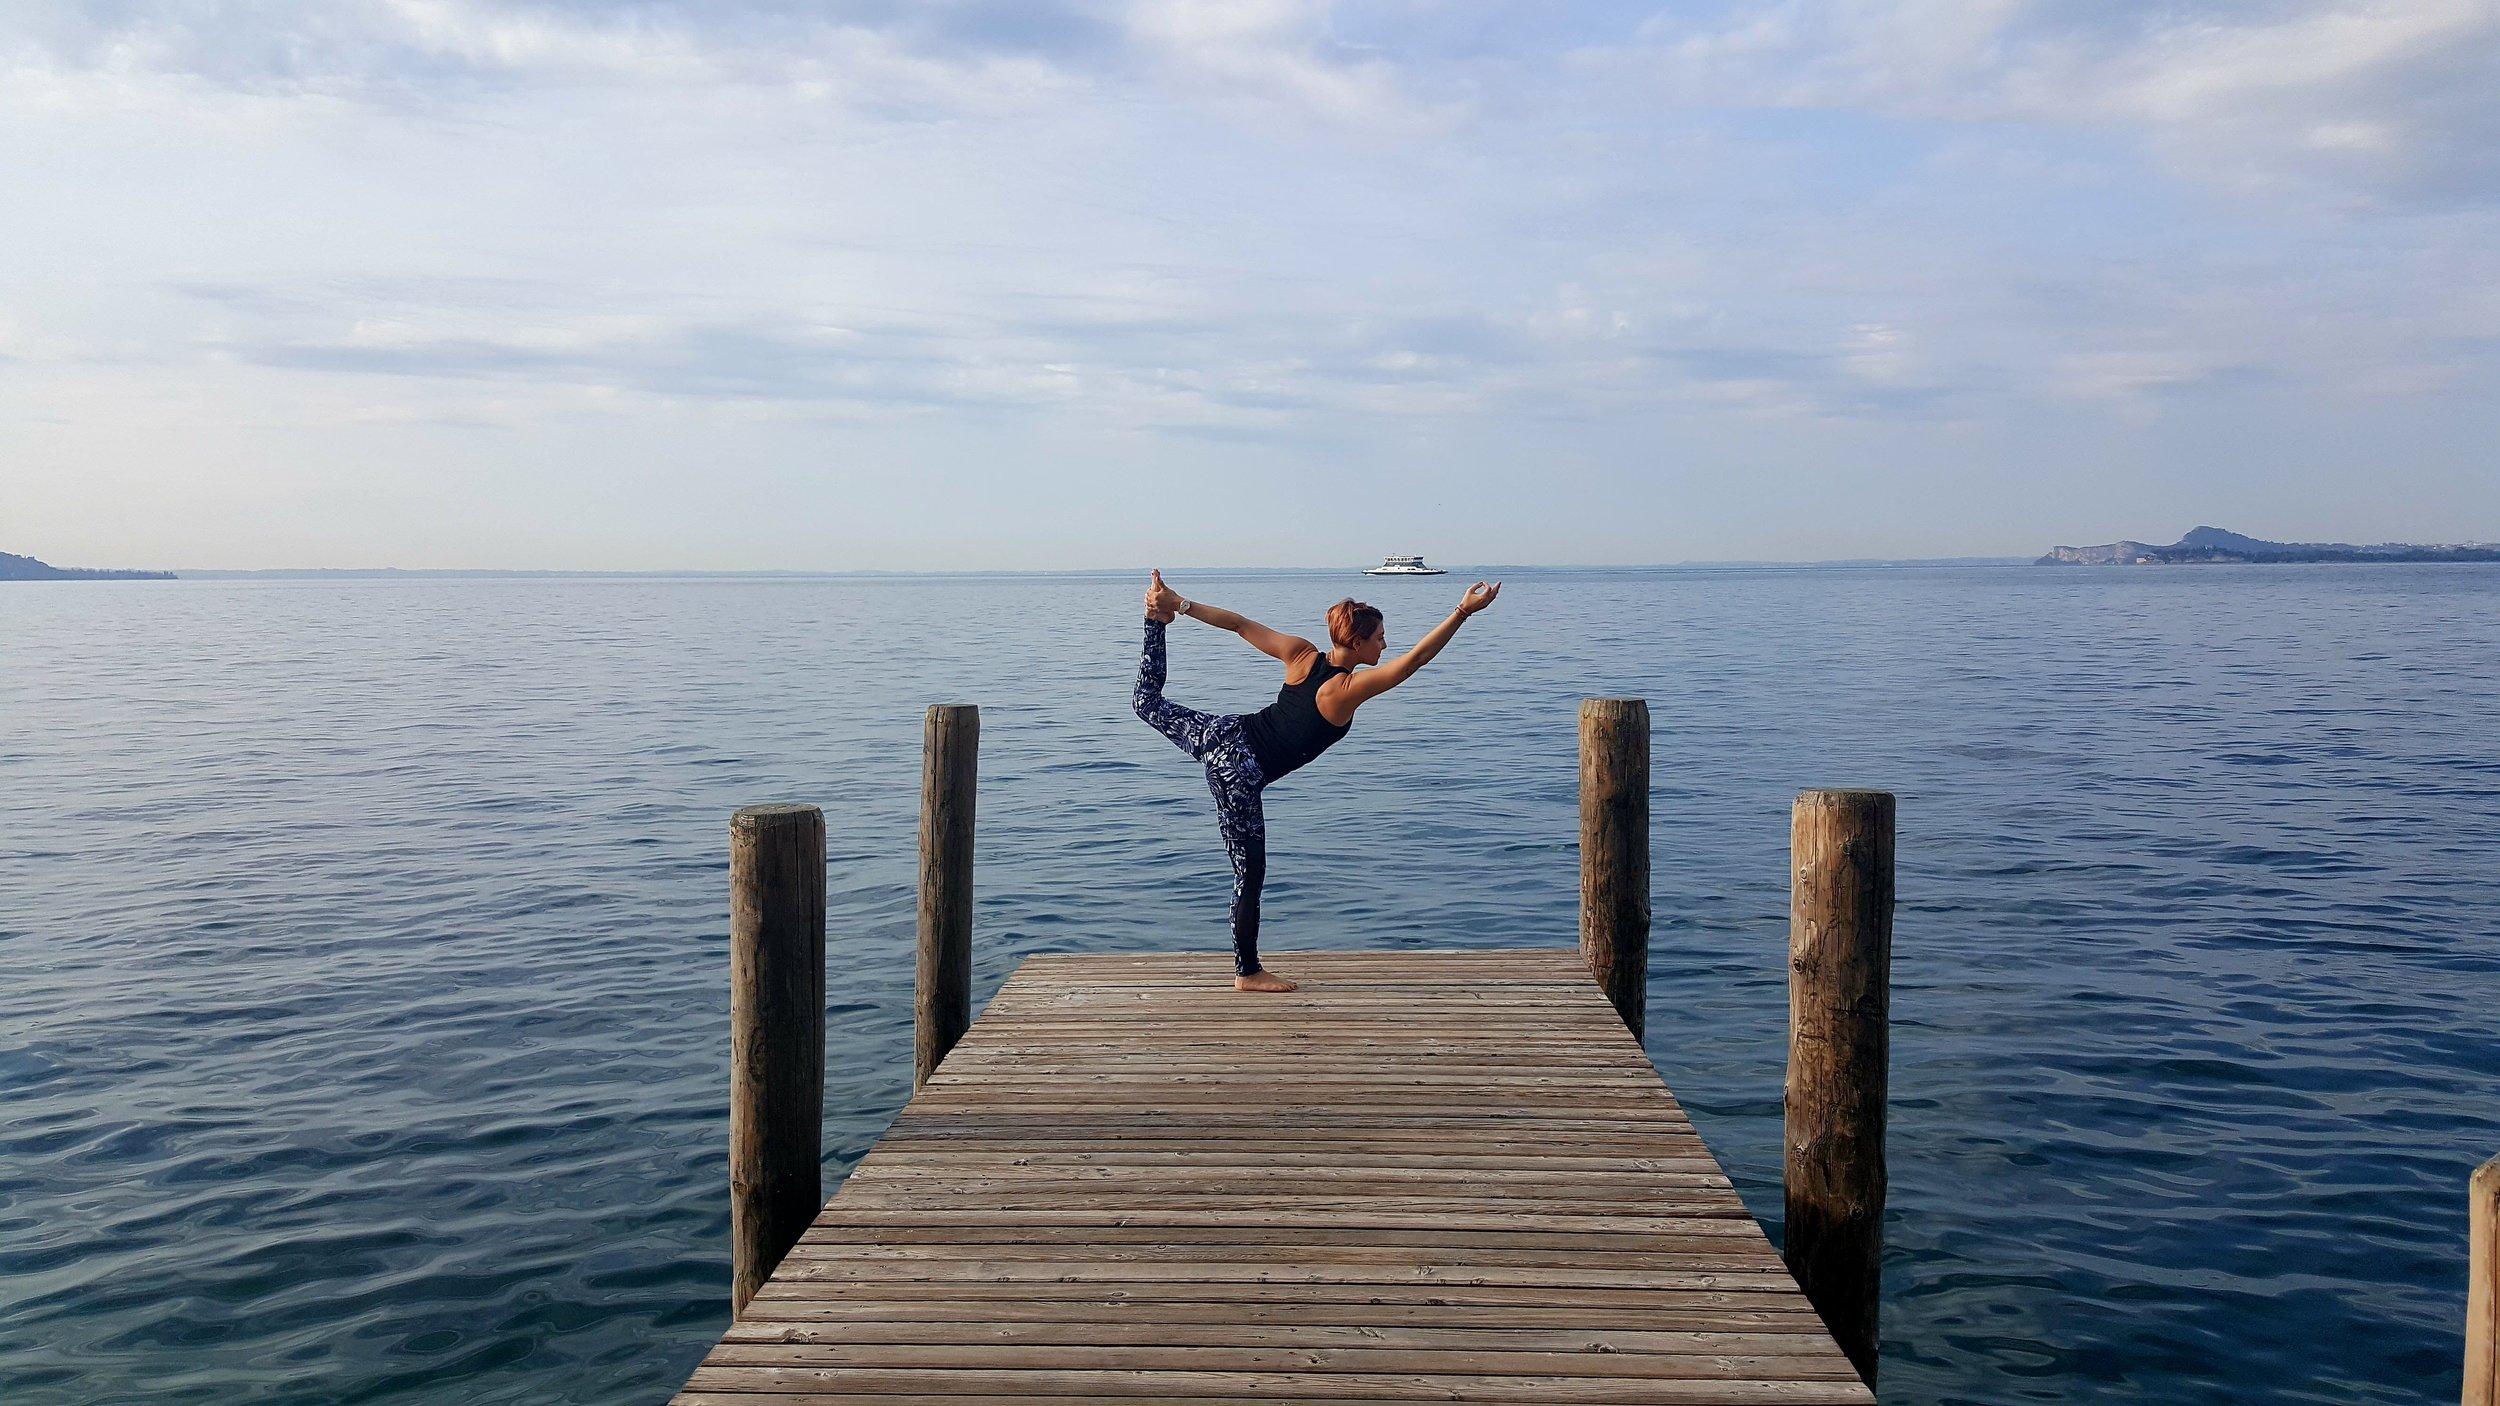 Eliyoga Online Private Yoga